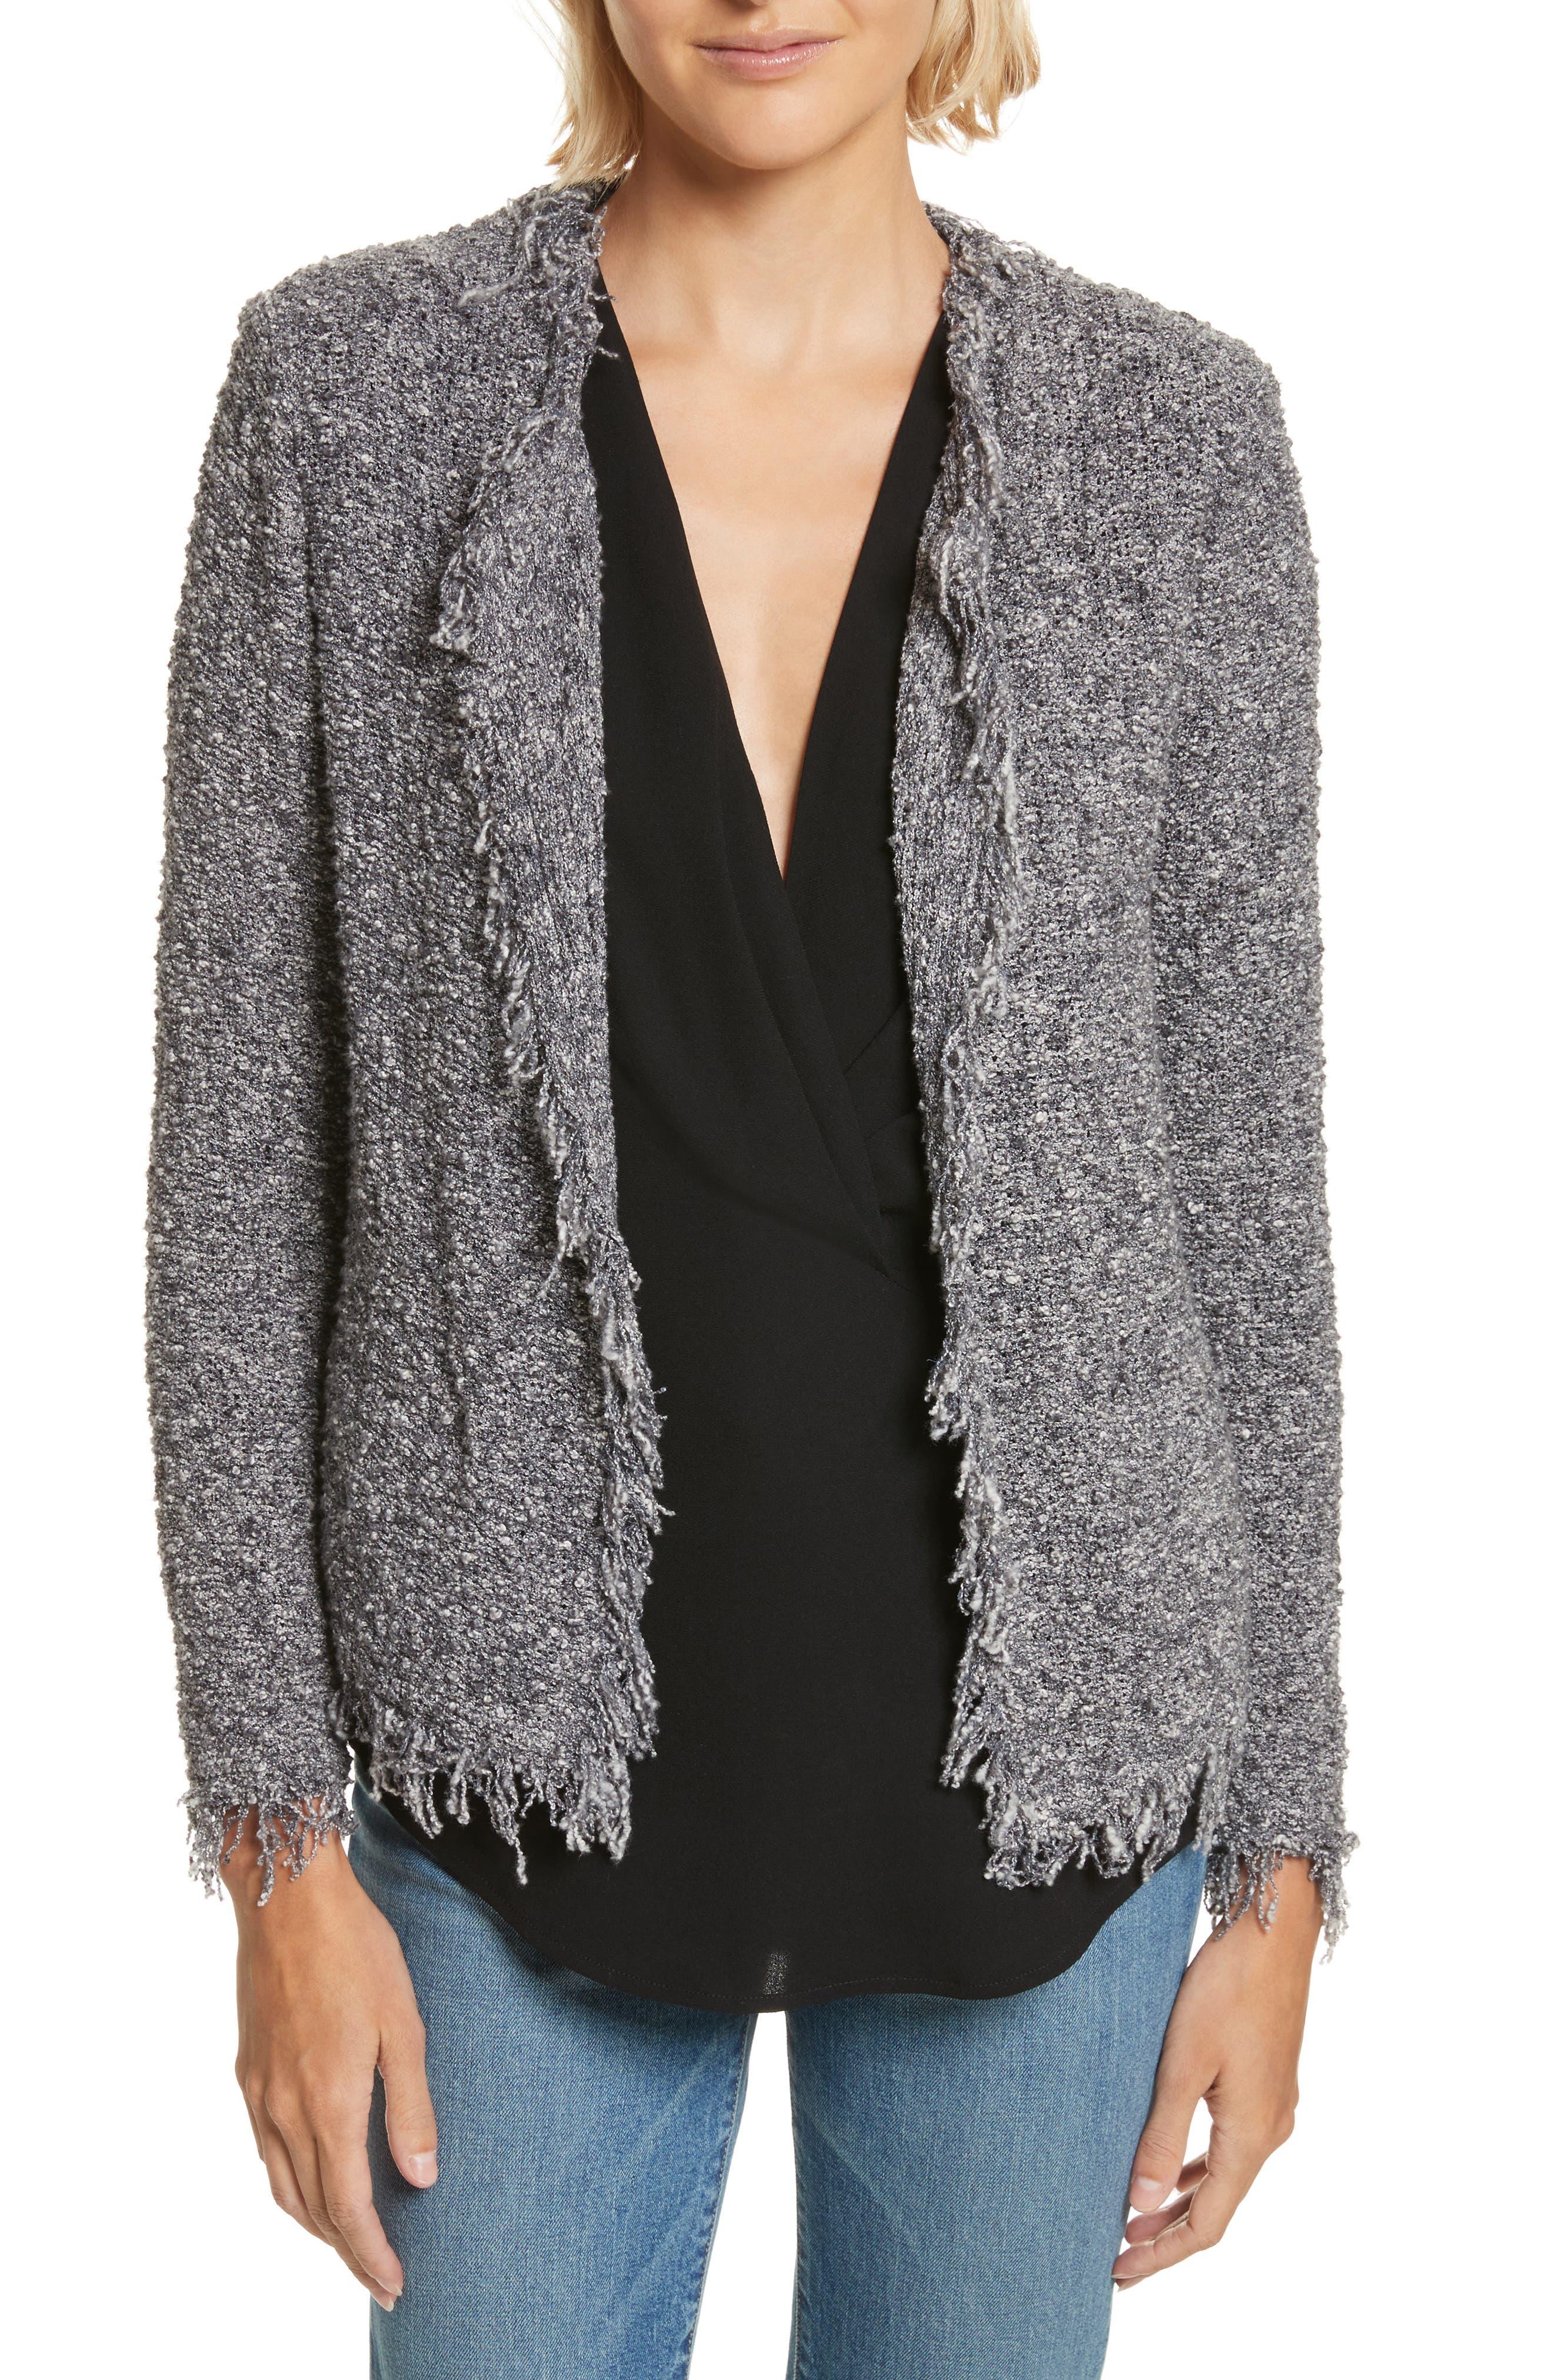 Shavanix Tweed Jacket,                         Main,                         color, 021